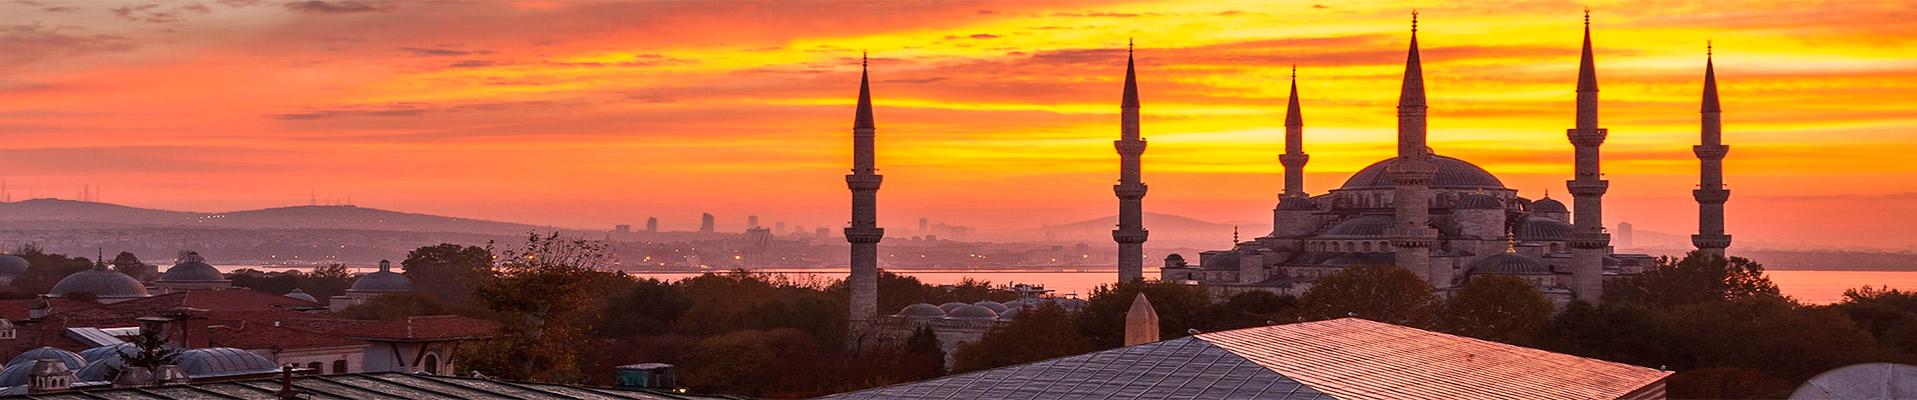 Atenas, Istambul e Cairo